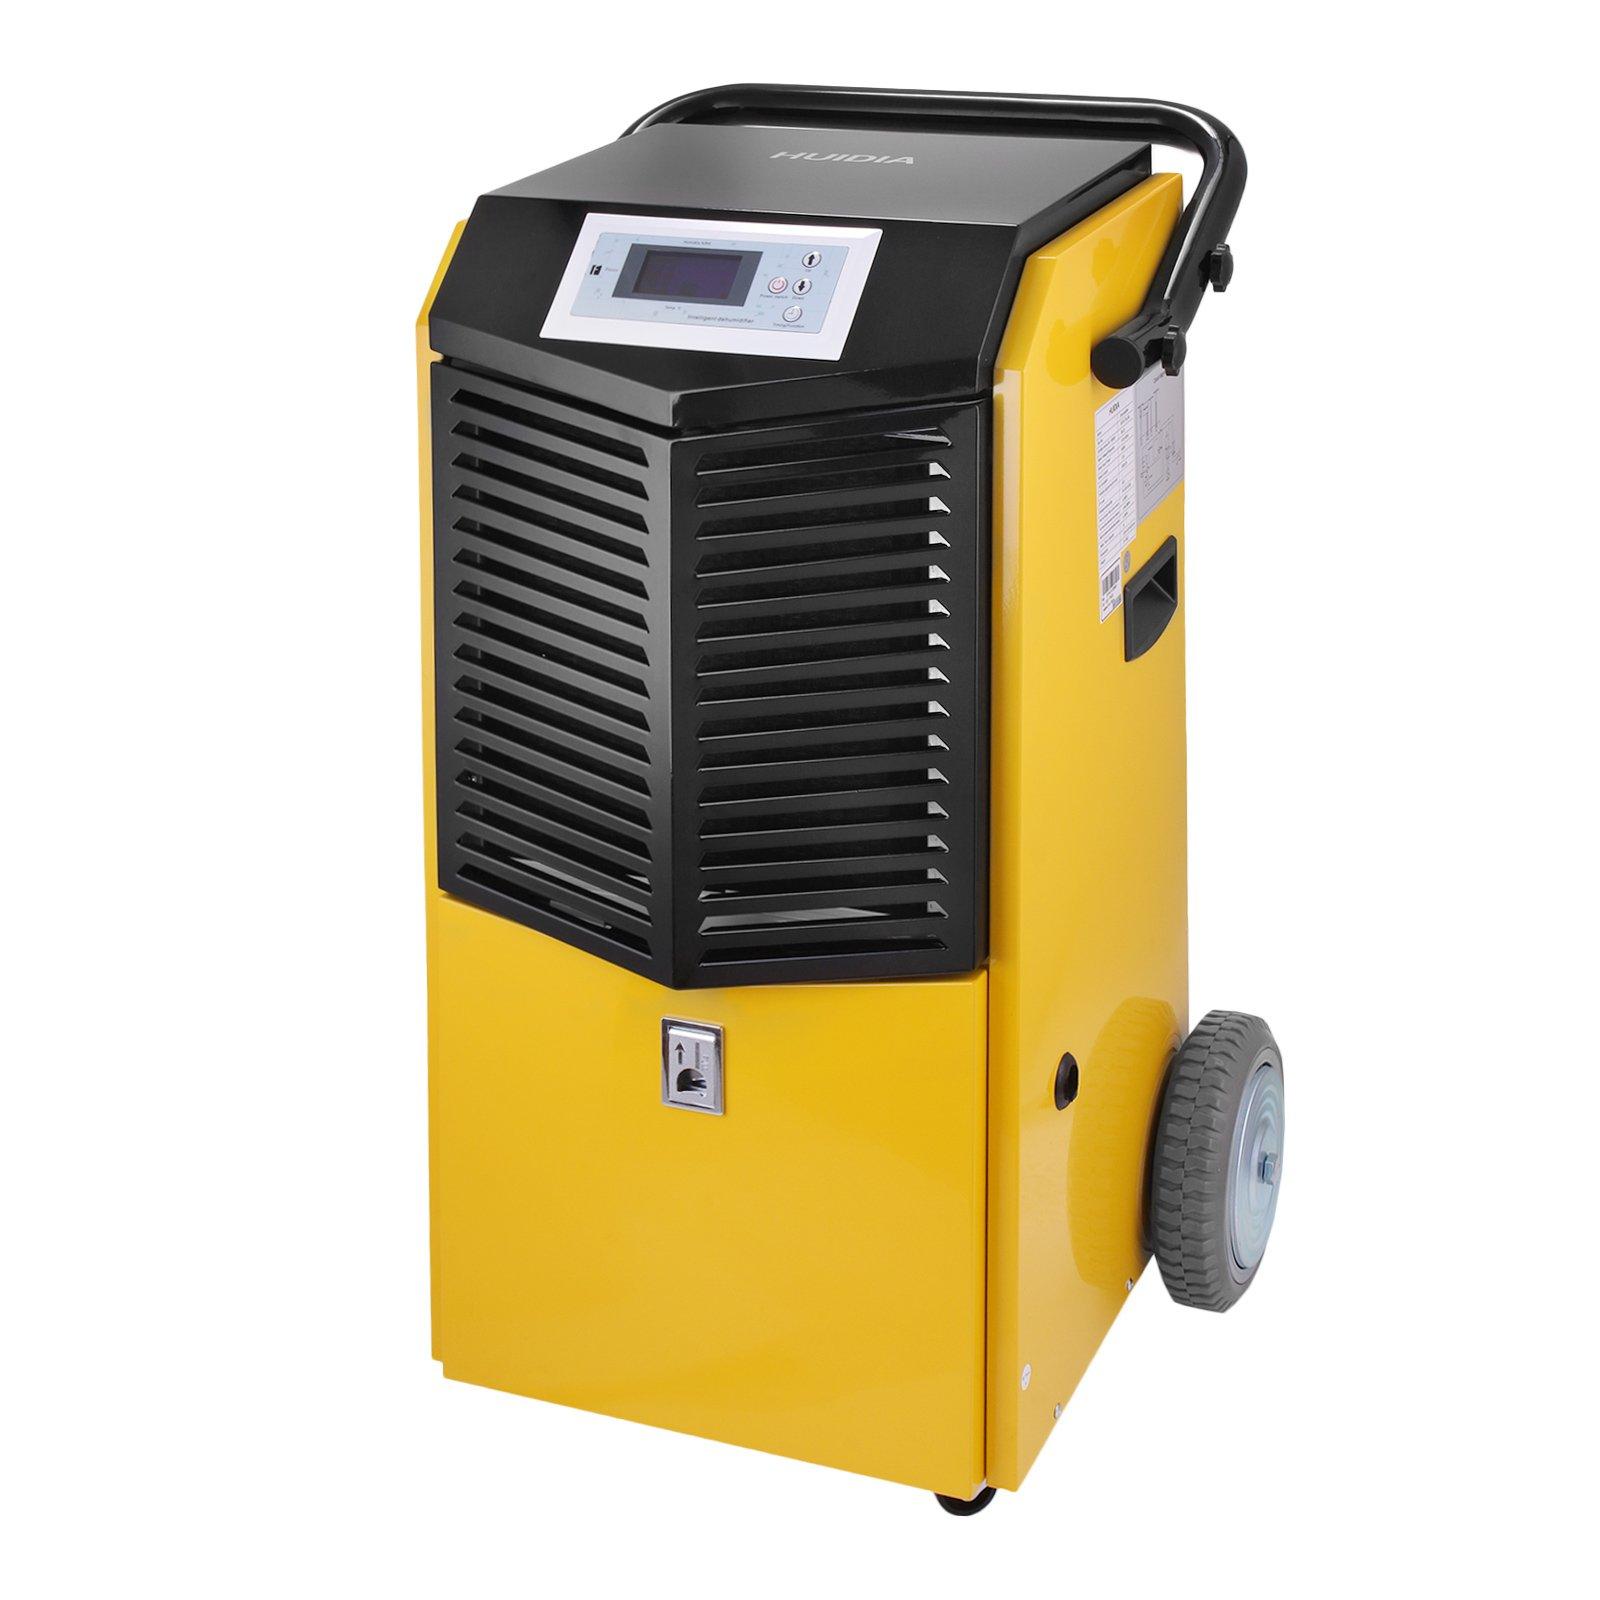 Happybuy Dehumidifier 55L/97 Pint Industrial Dehumidifier R410A/400 g Dehumidifier Electric 4.2MPa Dehumidifier Humidistat lP21 Dehumidifier Large Capacity(Yellow)